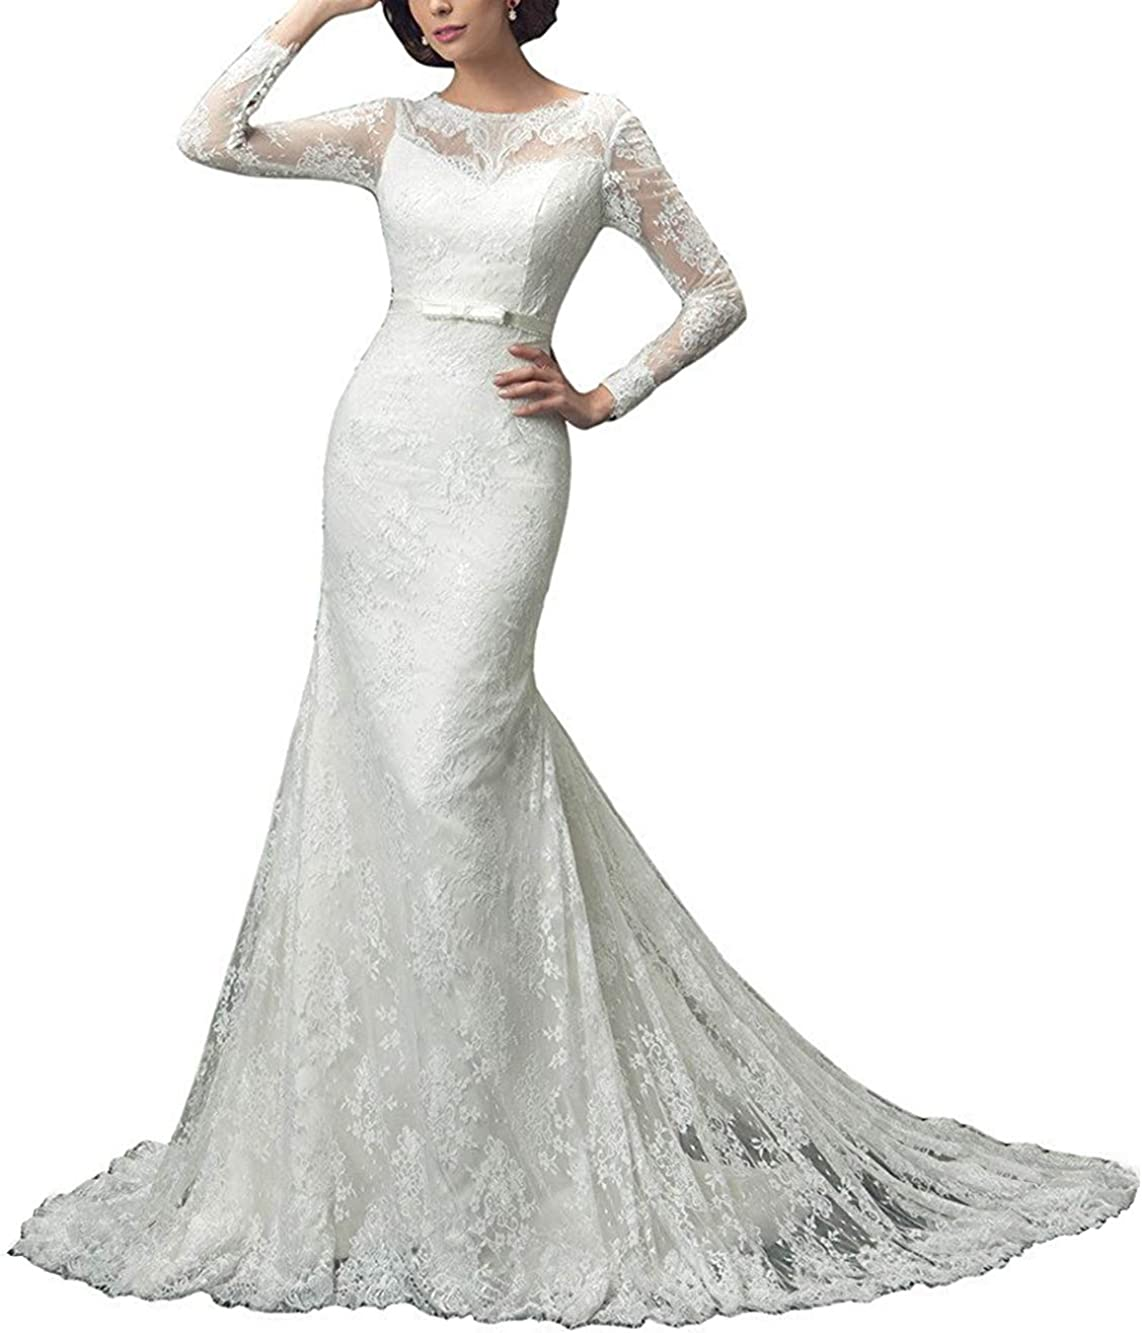 Max 55% OFF M Bridal Women's Illusion Memphis Mall Long Crew Neck Mermaid Bri Sleeve